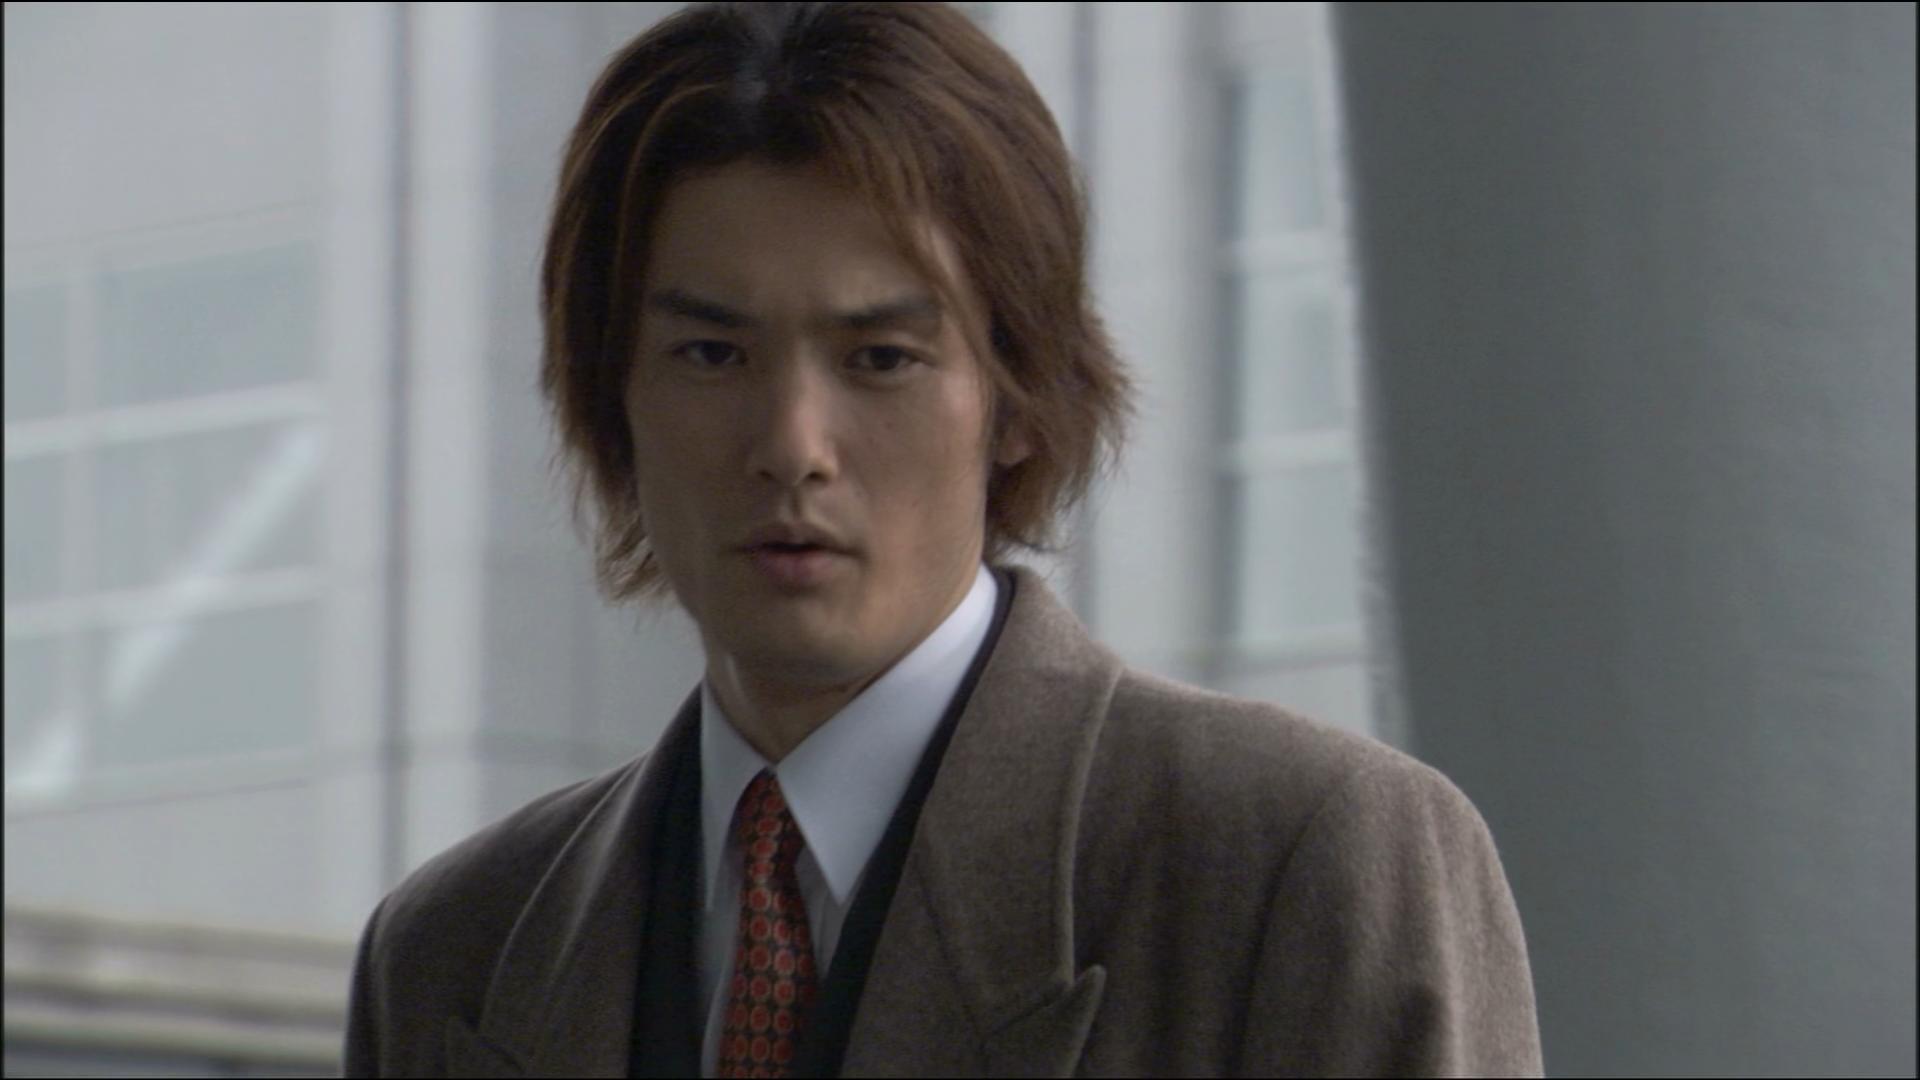 Shuichi Kitaoka/Episode Final